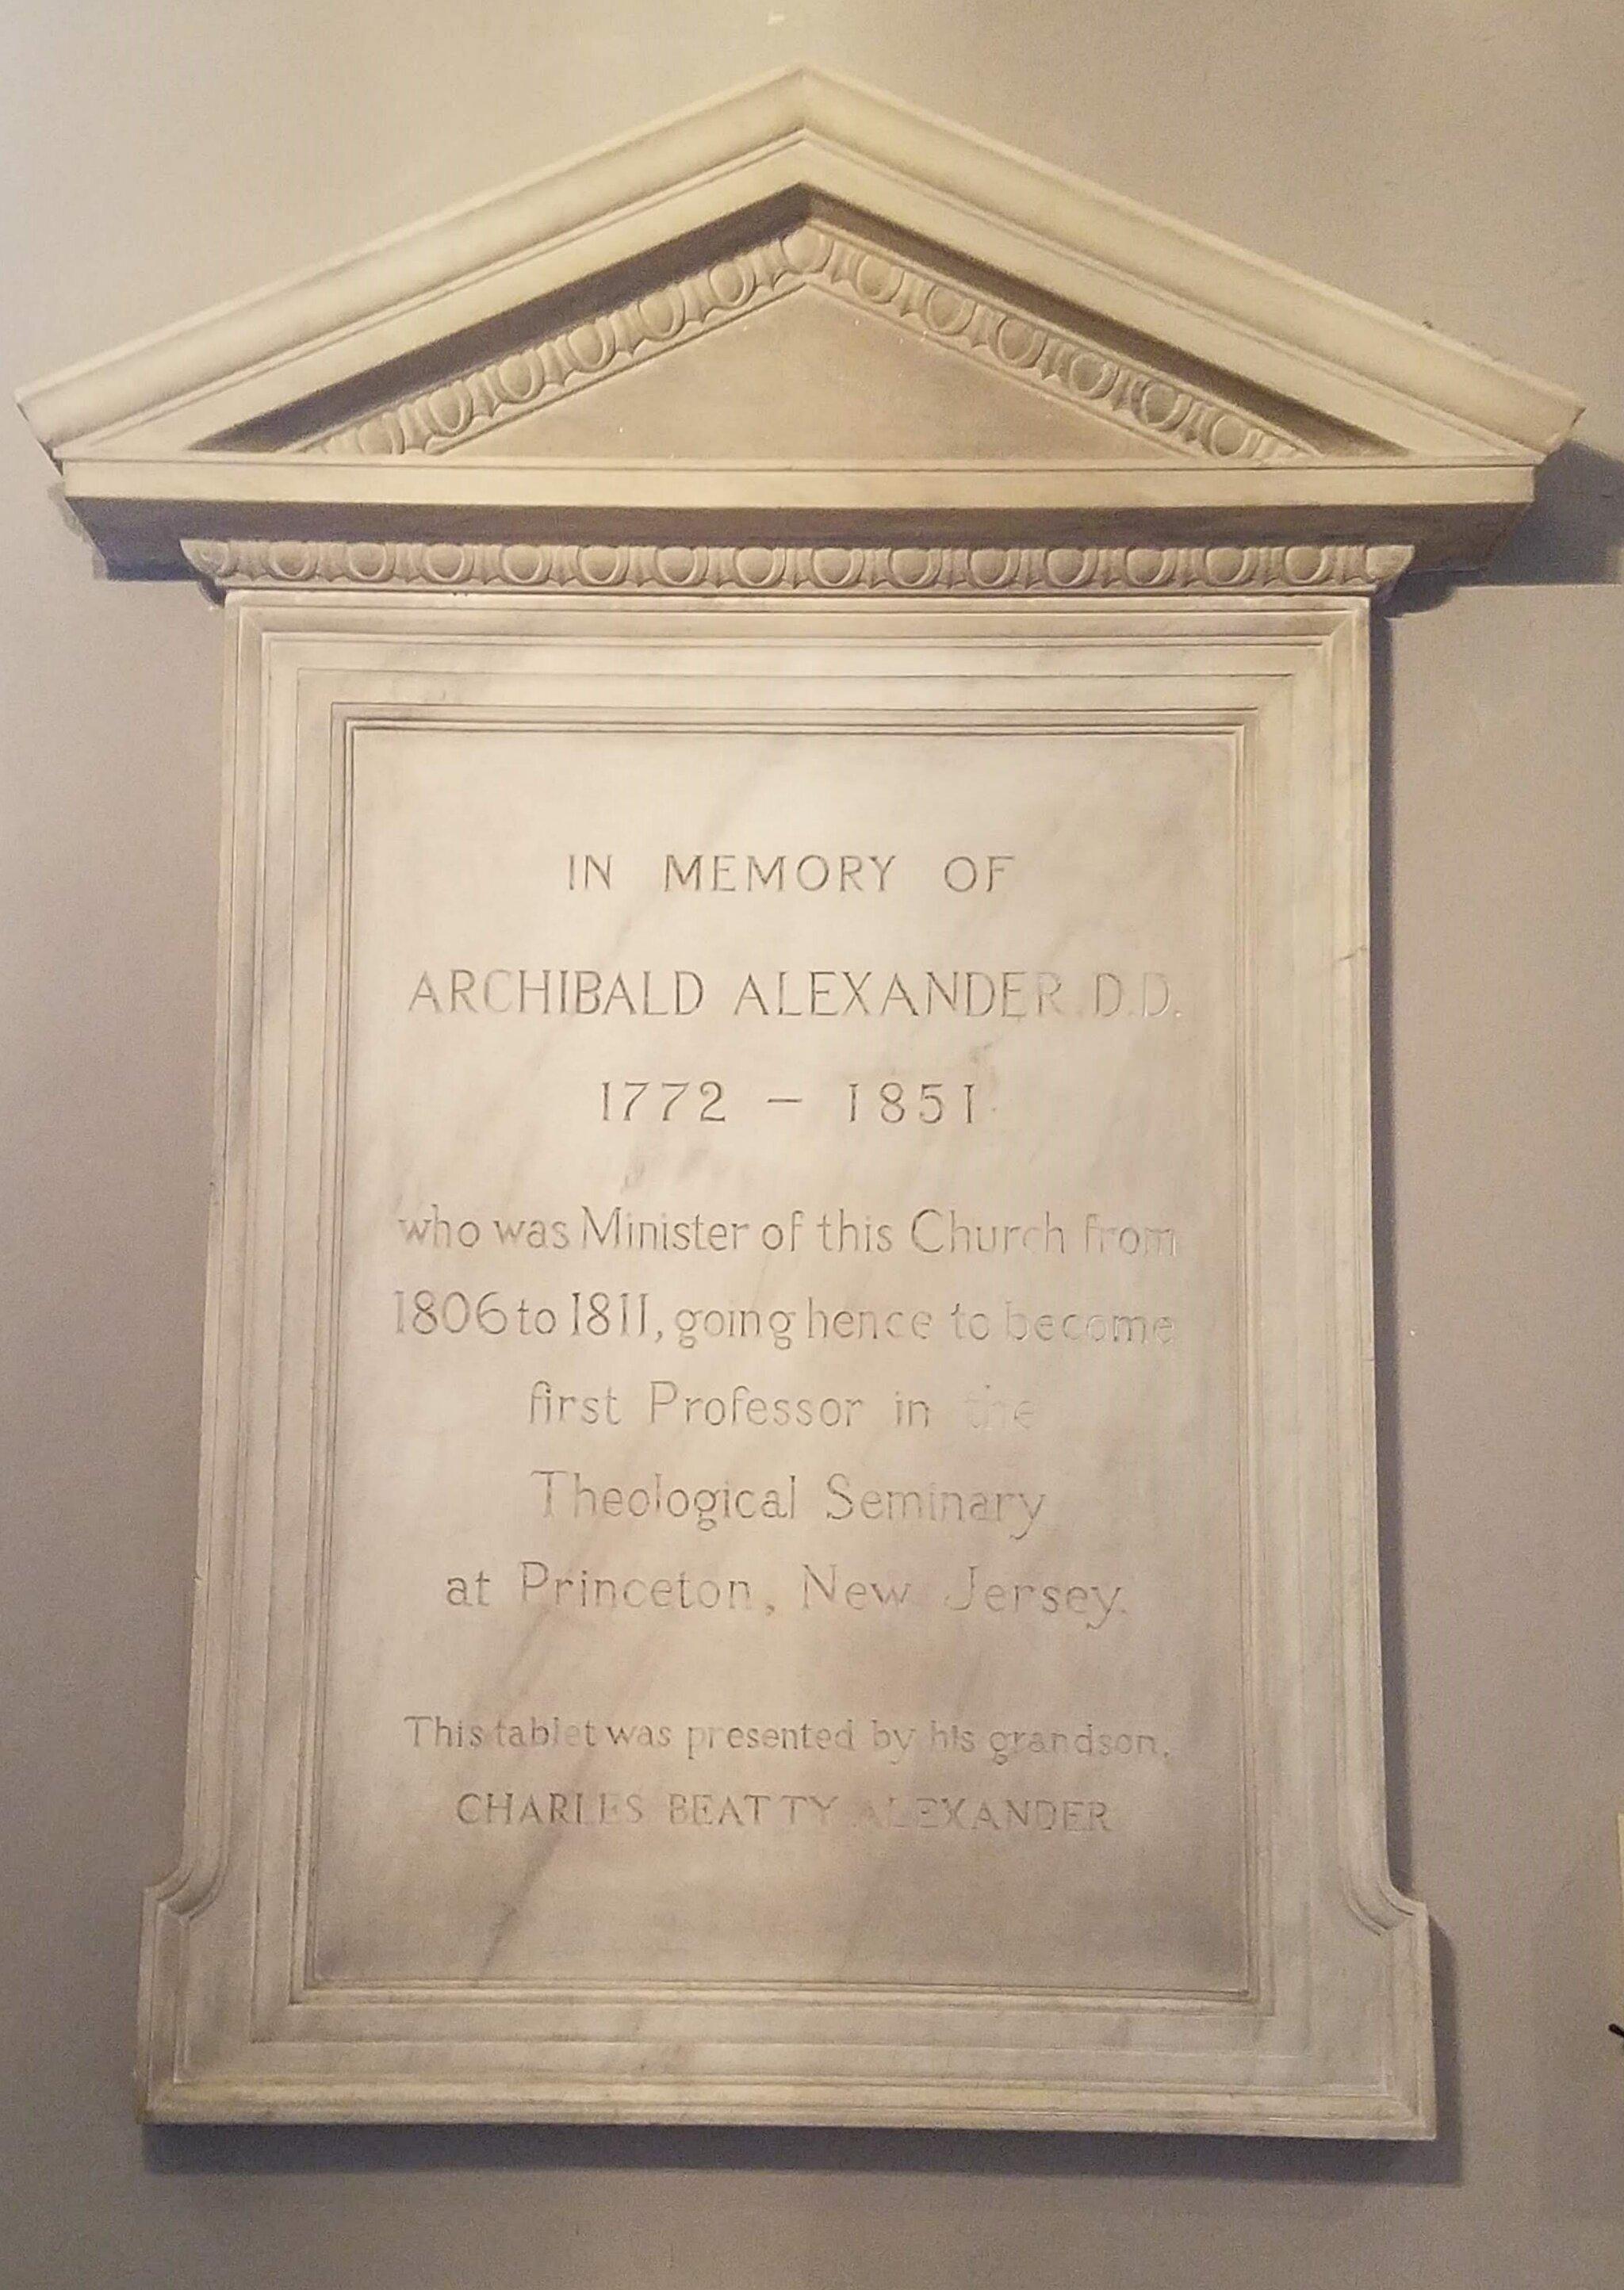 Commemorative tablet at the Old Pine Street Presbyterian Church, Philadelphia, Pennsylvania (photo credit: R. Andrew Myers).